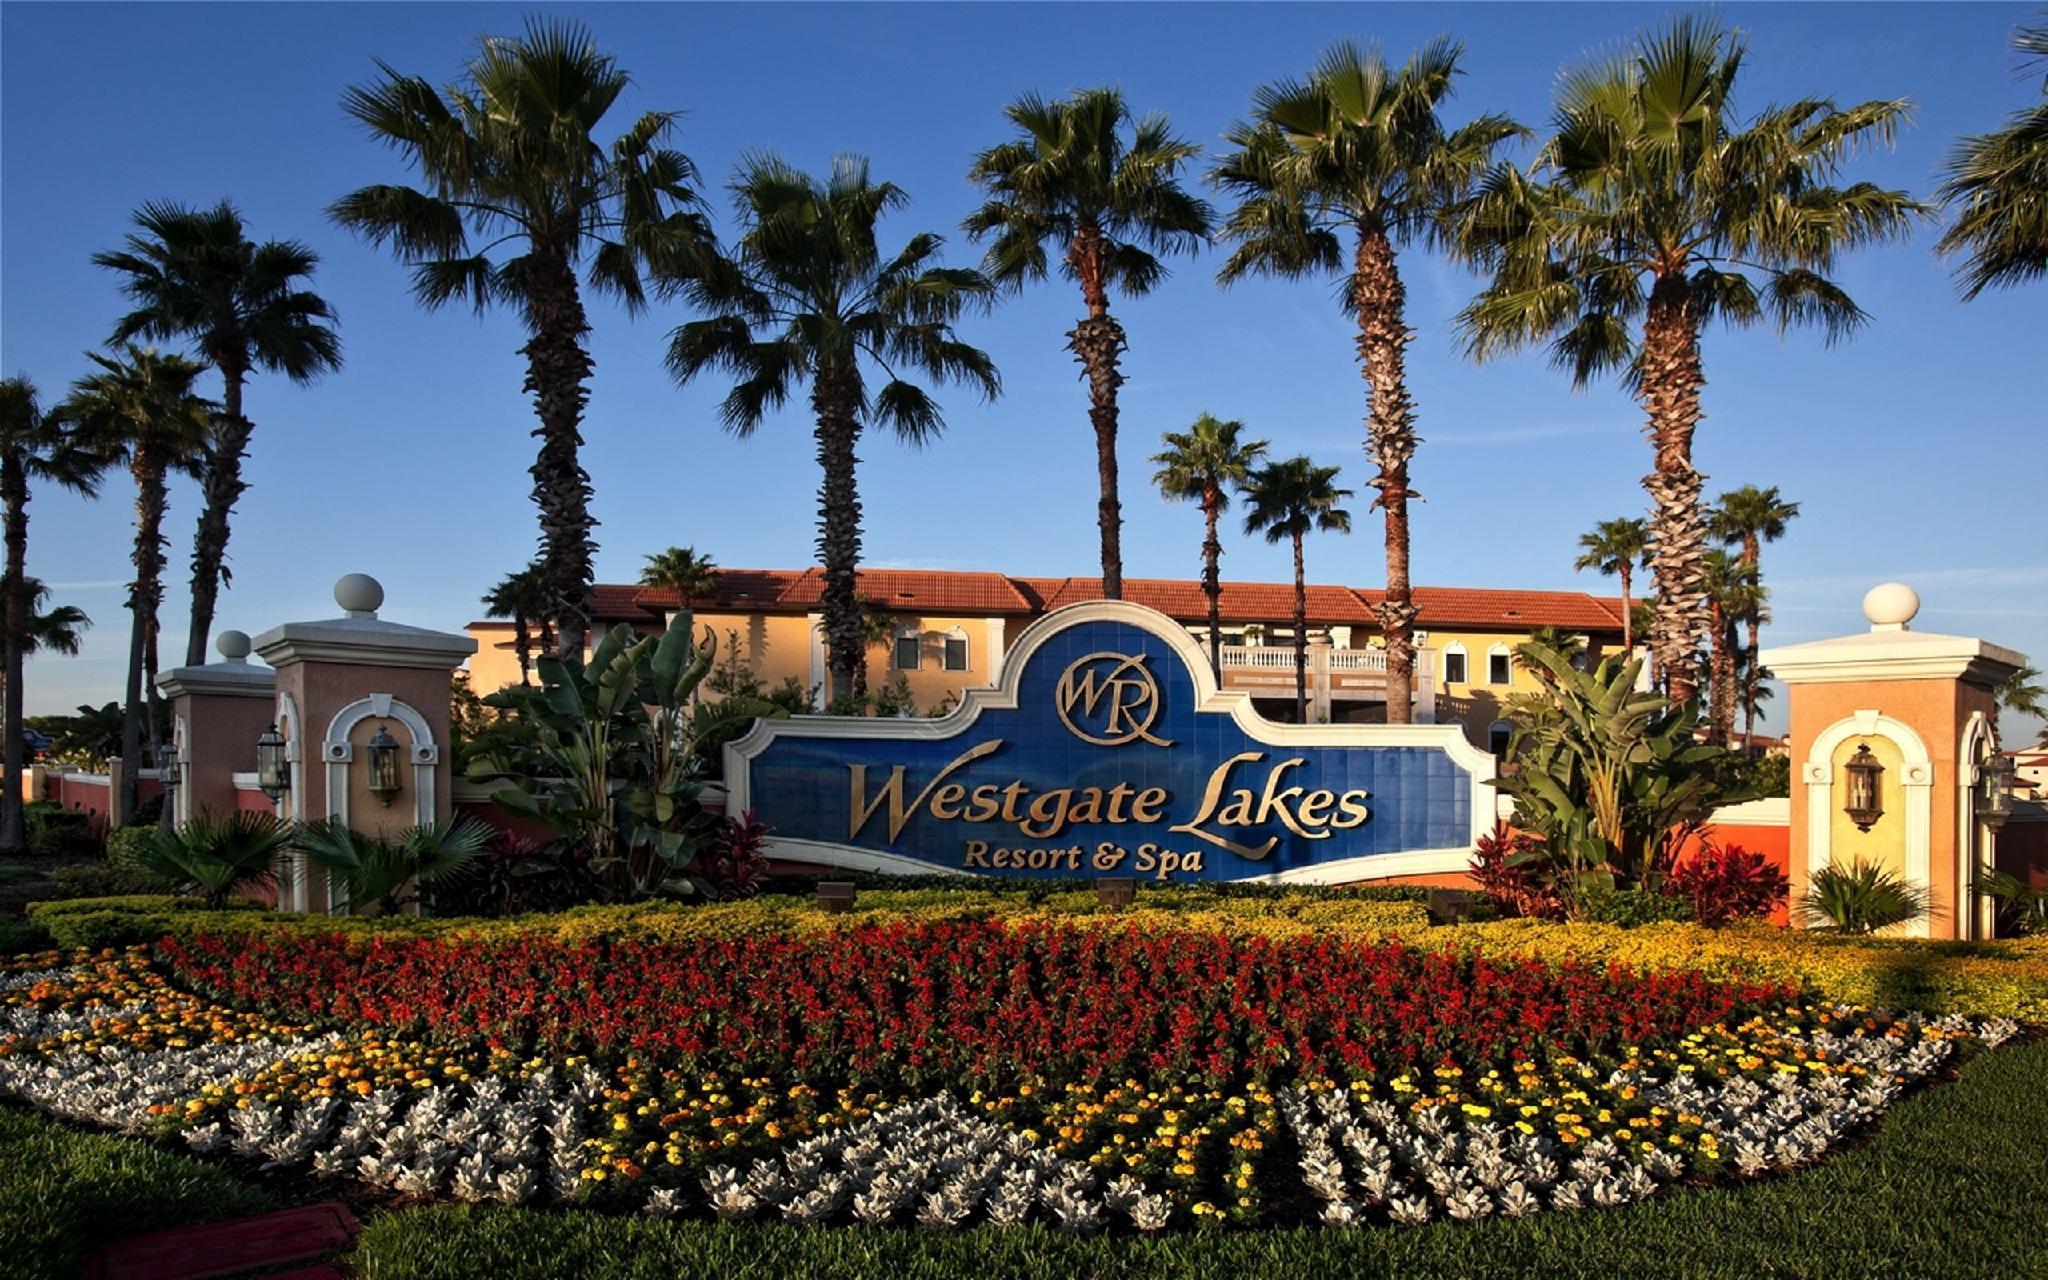 4 reasons to choose Westgate Lakes Resort and Spa